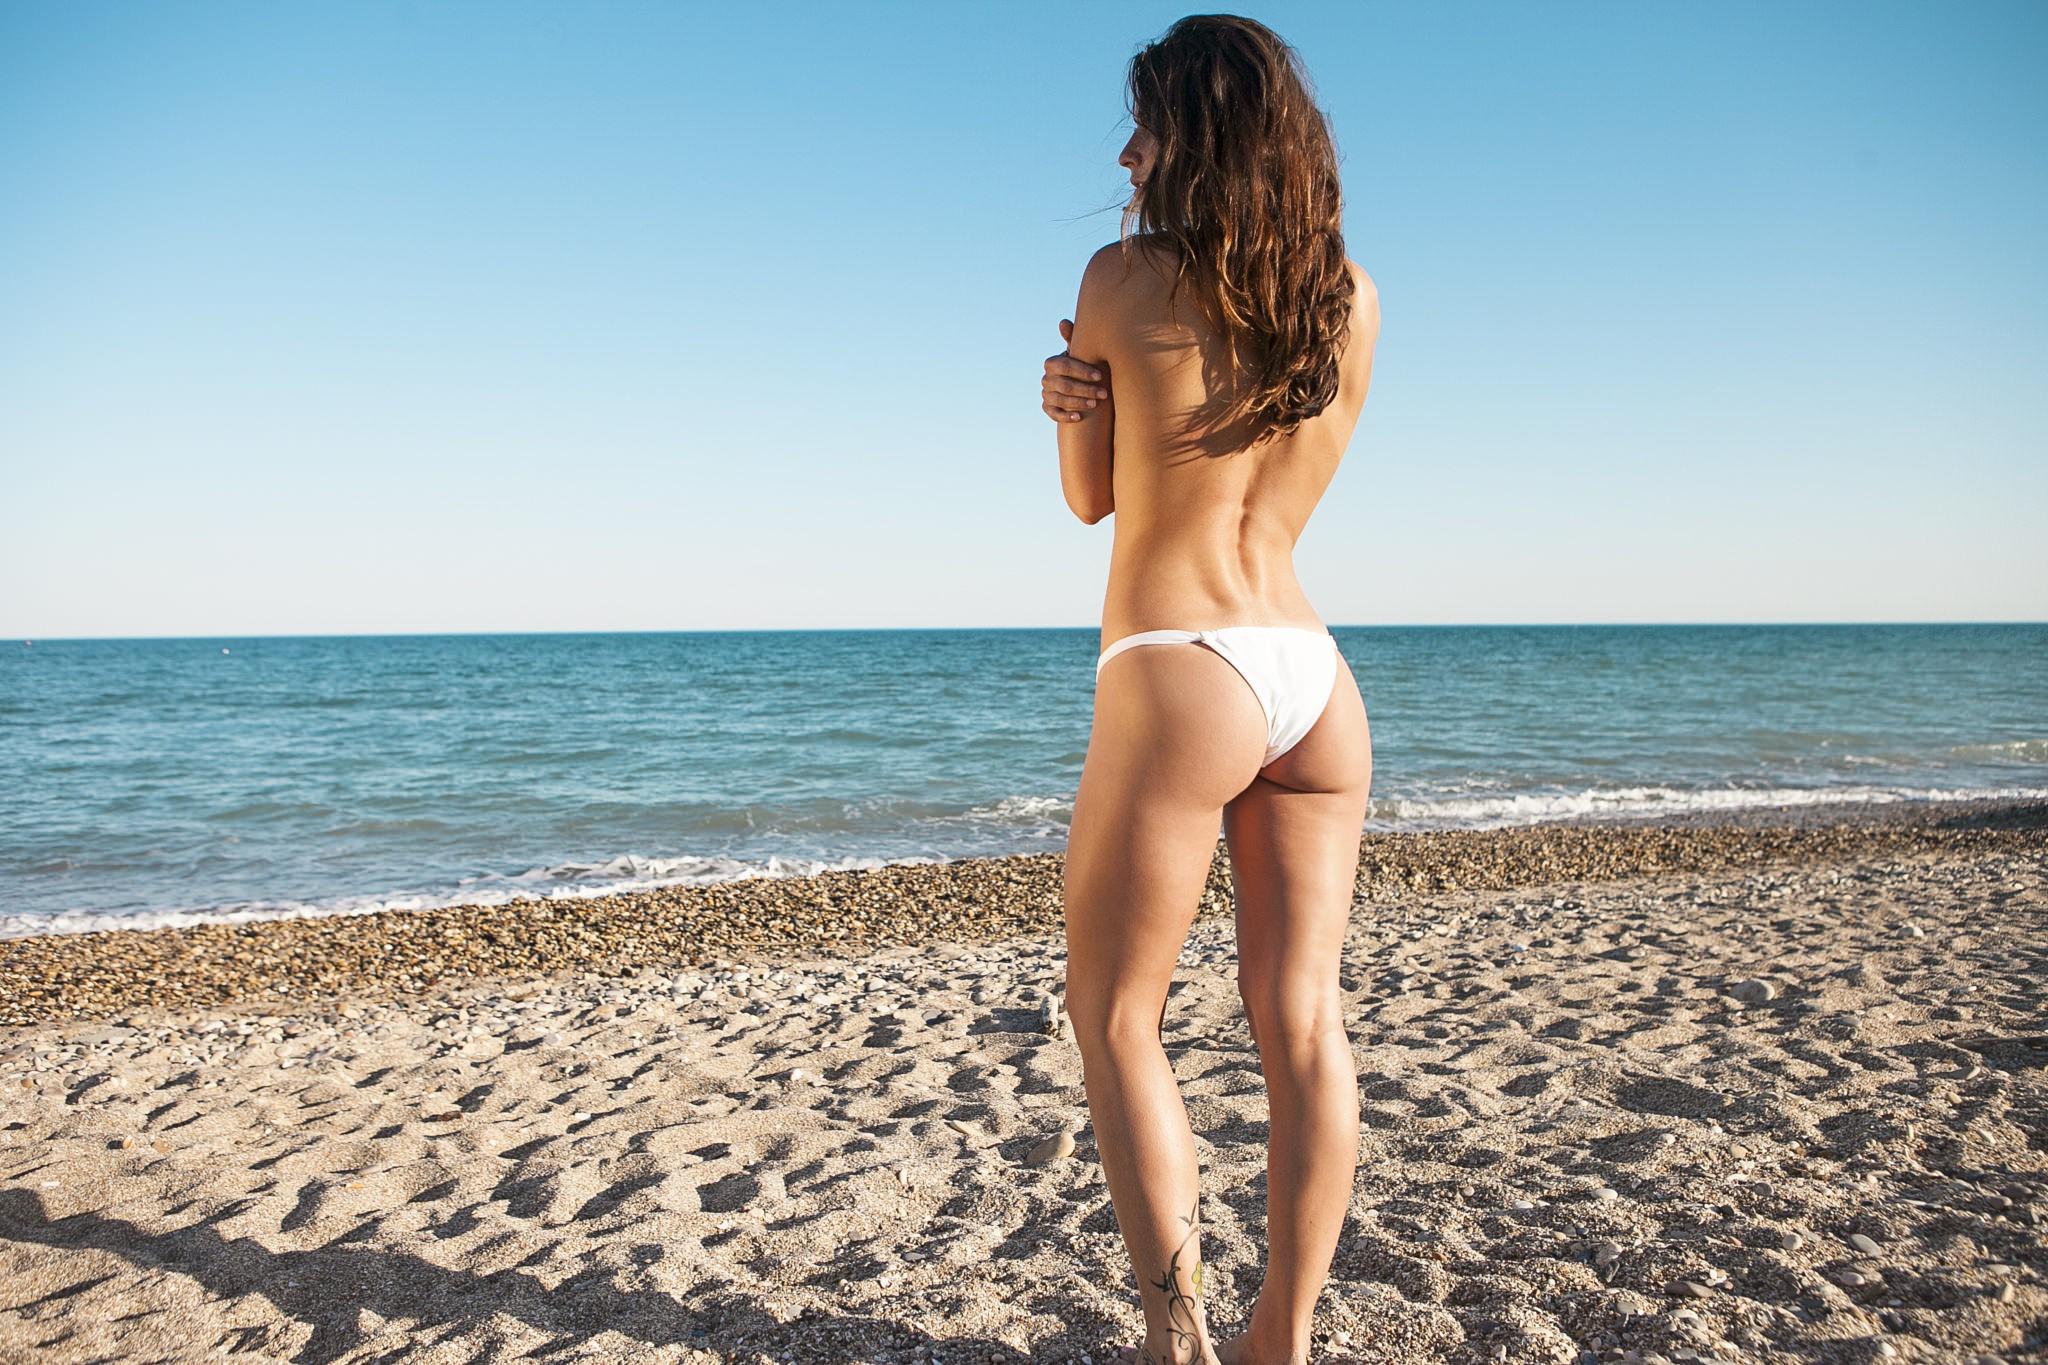 9a98f4dbe489 Fondos de pantalla : mujer, modelo, mar, apuntalar, arena, playa ...